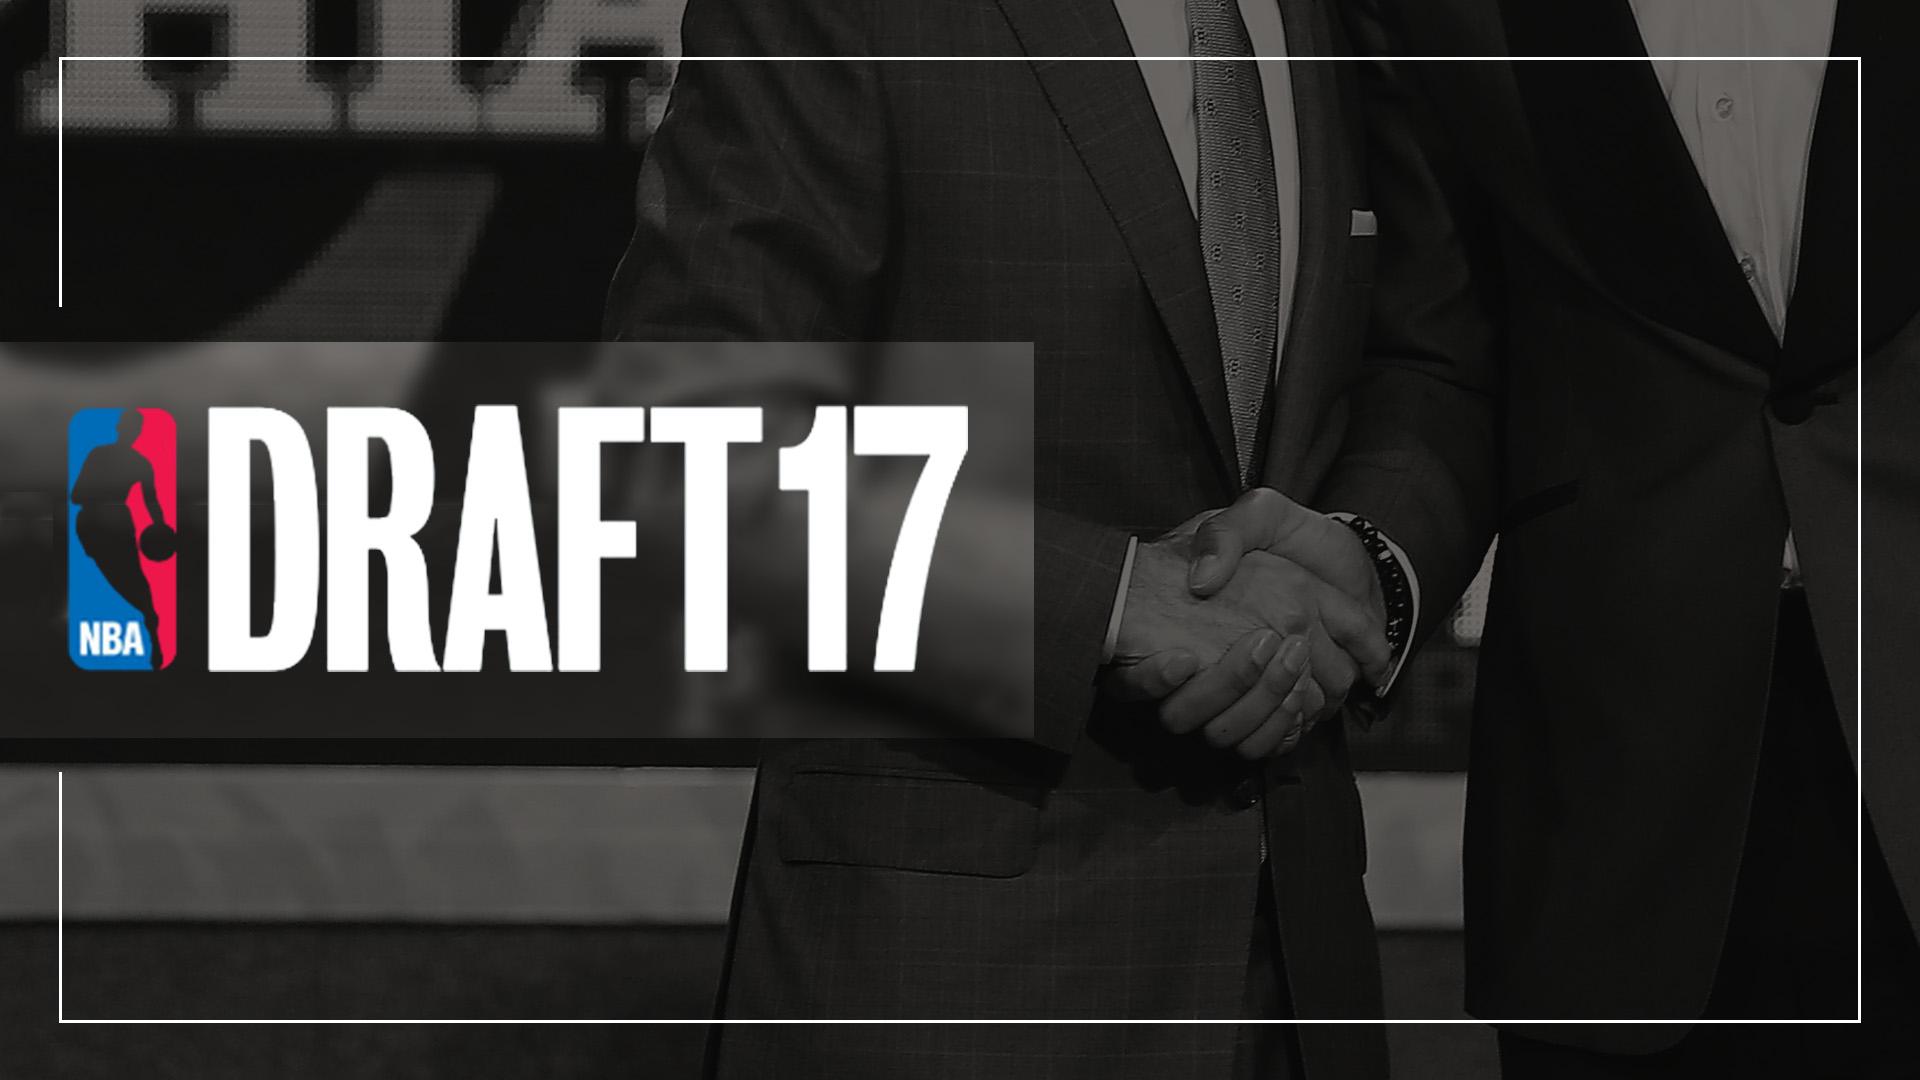 Nba-draft-genericftrjpg_1x8e4l4tkc5gg1o75m2bwtmzo1